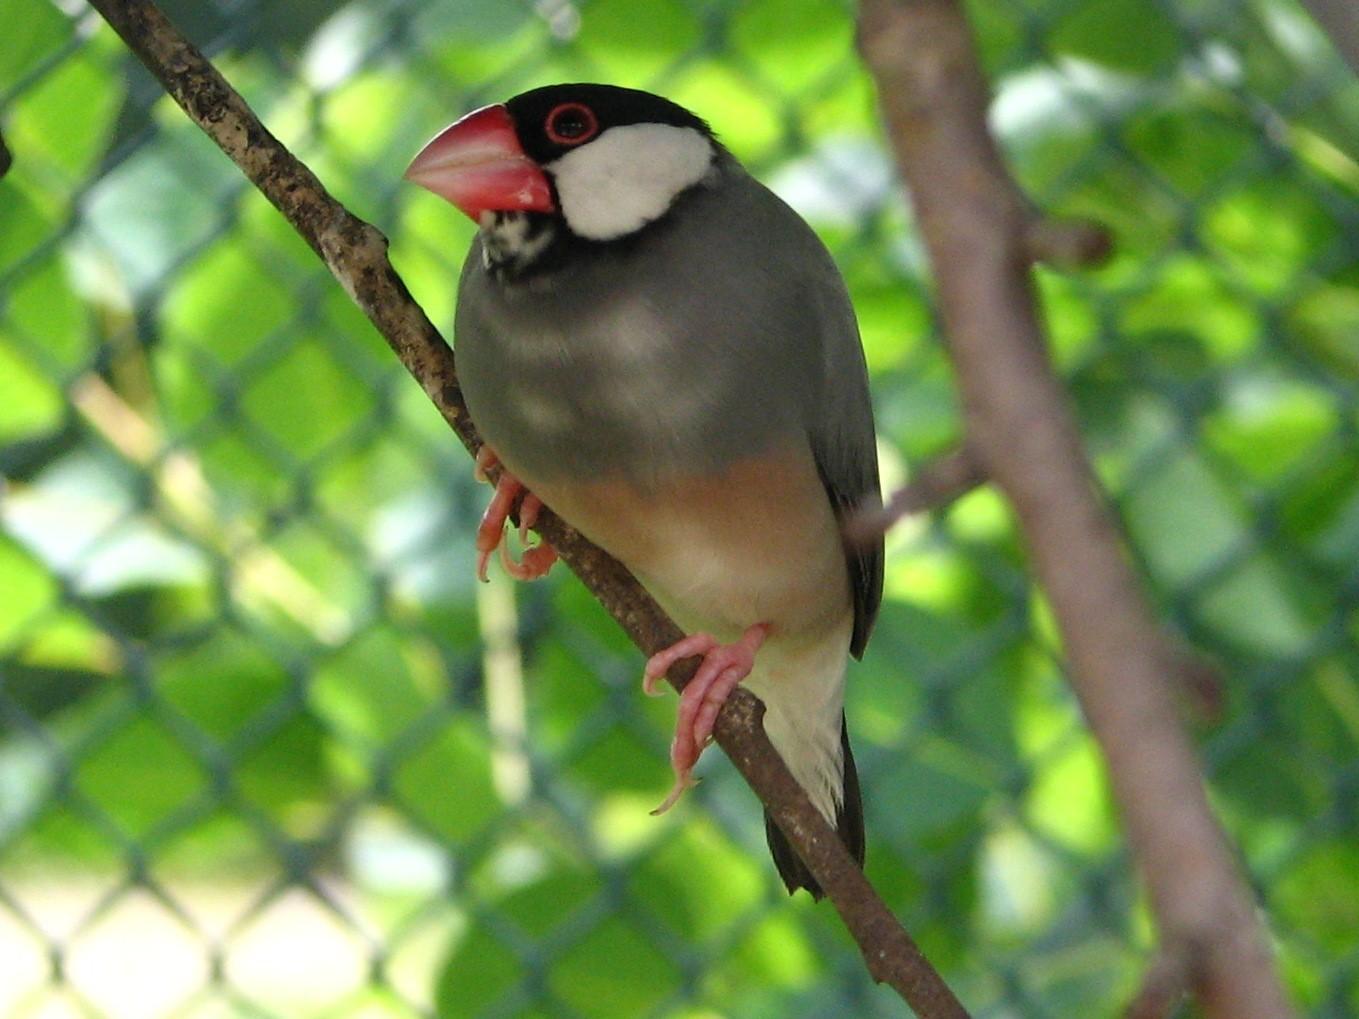 New species list not retroactive: Ministry